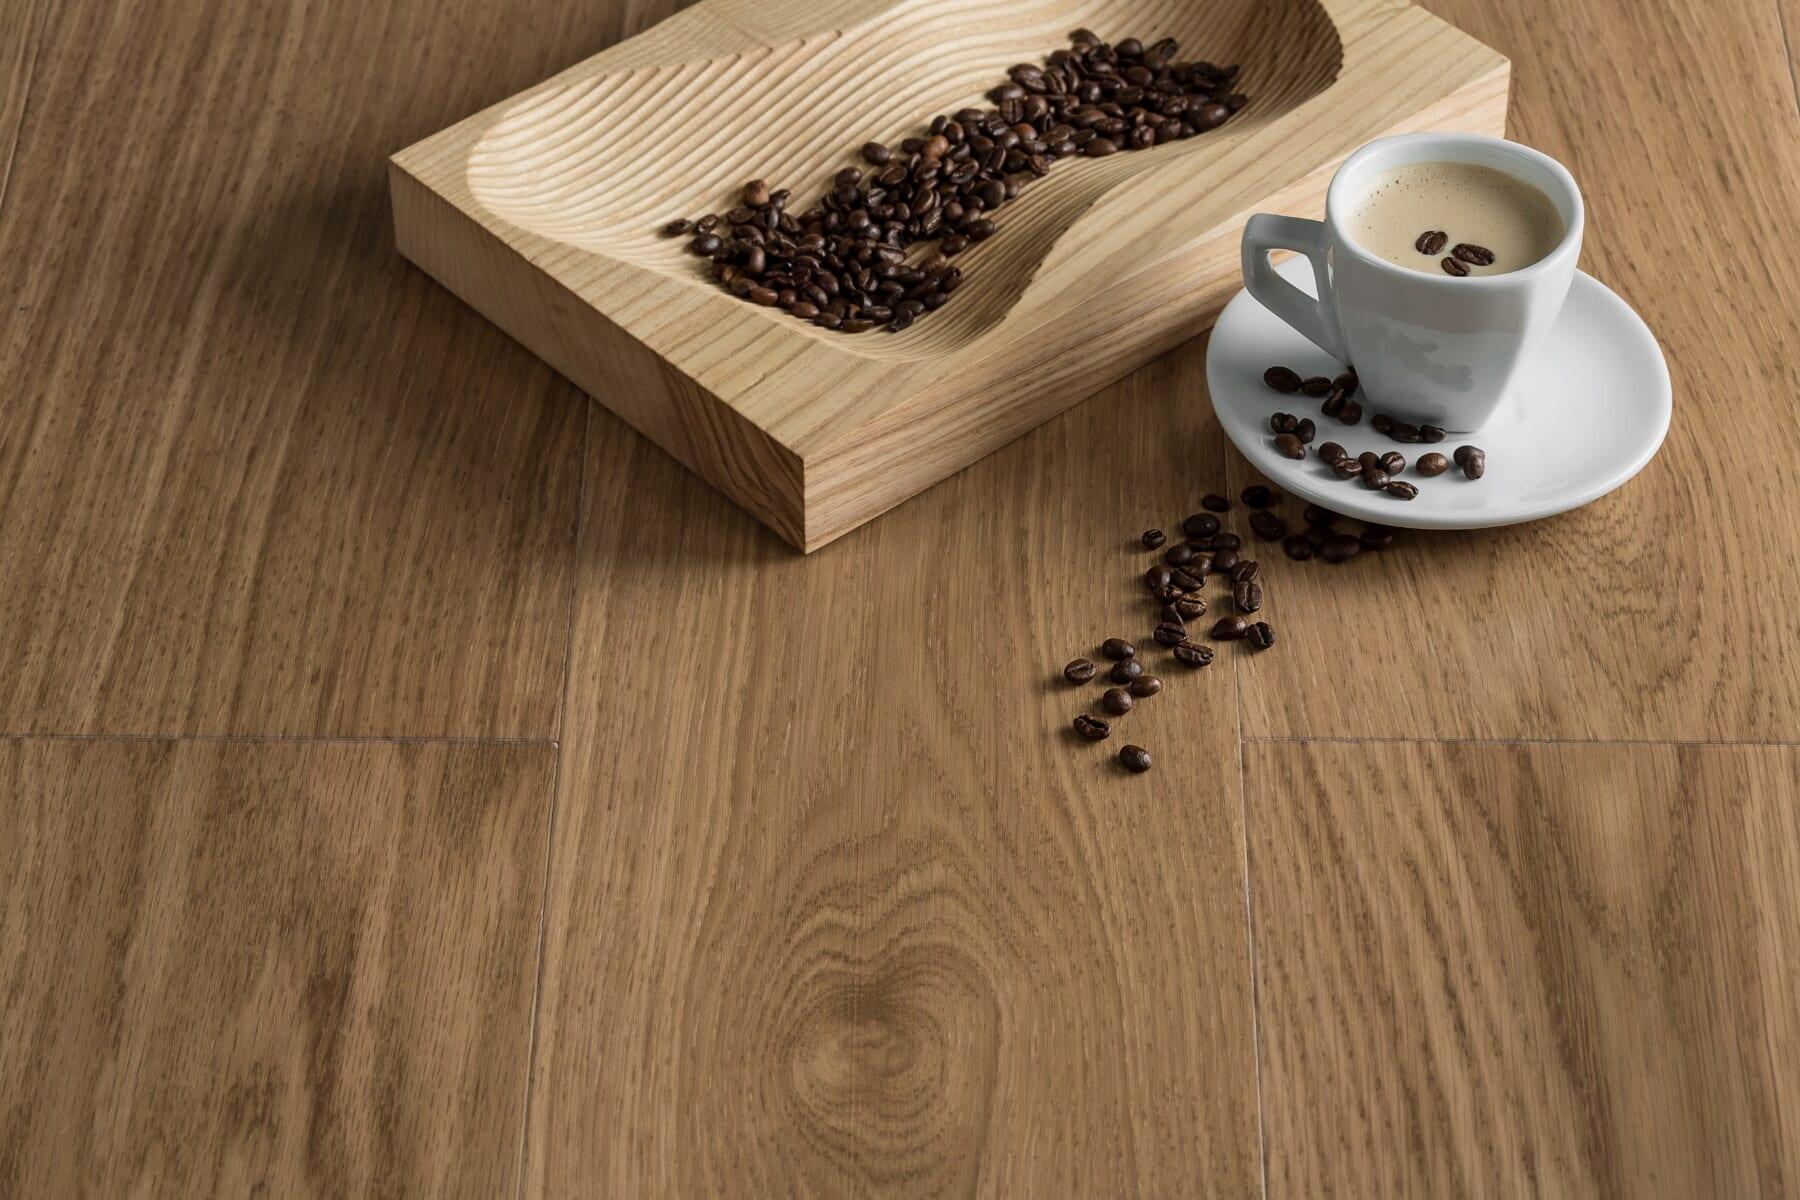 Cappuccino, Kaffeetasse, Samen, Aroma, Koffein, Holz, Kaffee, Getränke, Tasse, Espresso